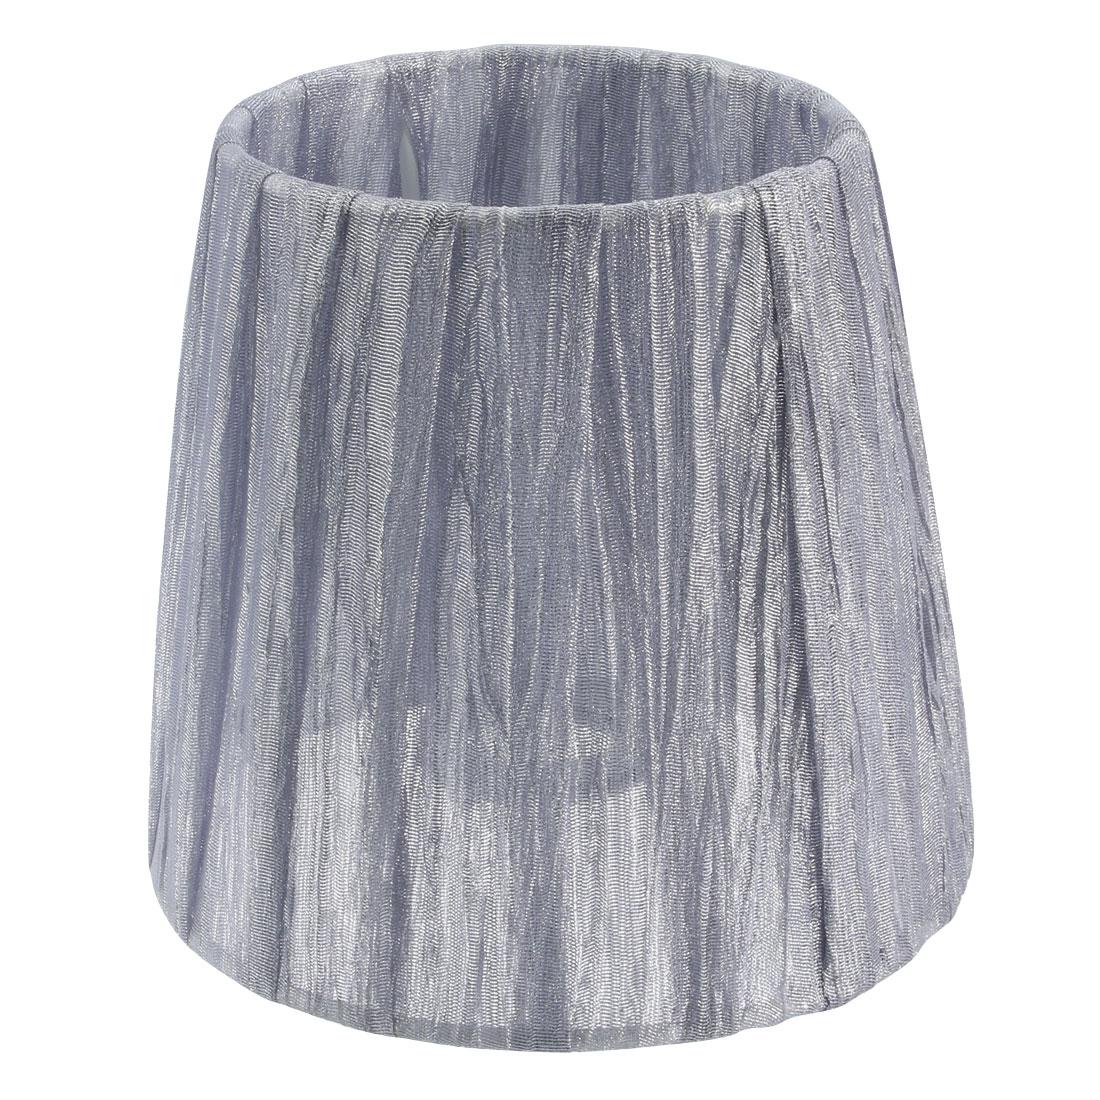 Light Shade Droplight Wall Lamp Shade Light Gray 110mm x 150mm x 140mm